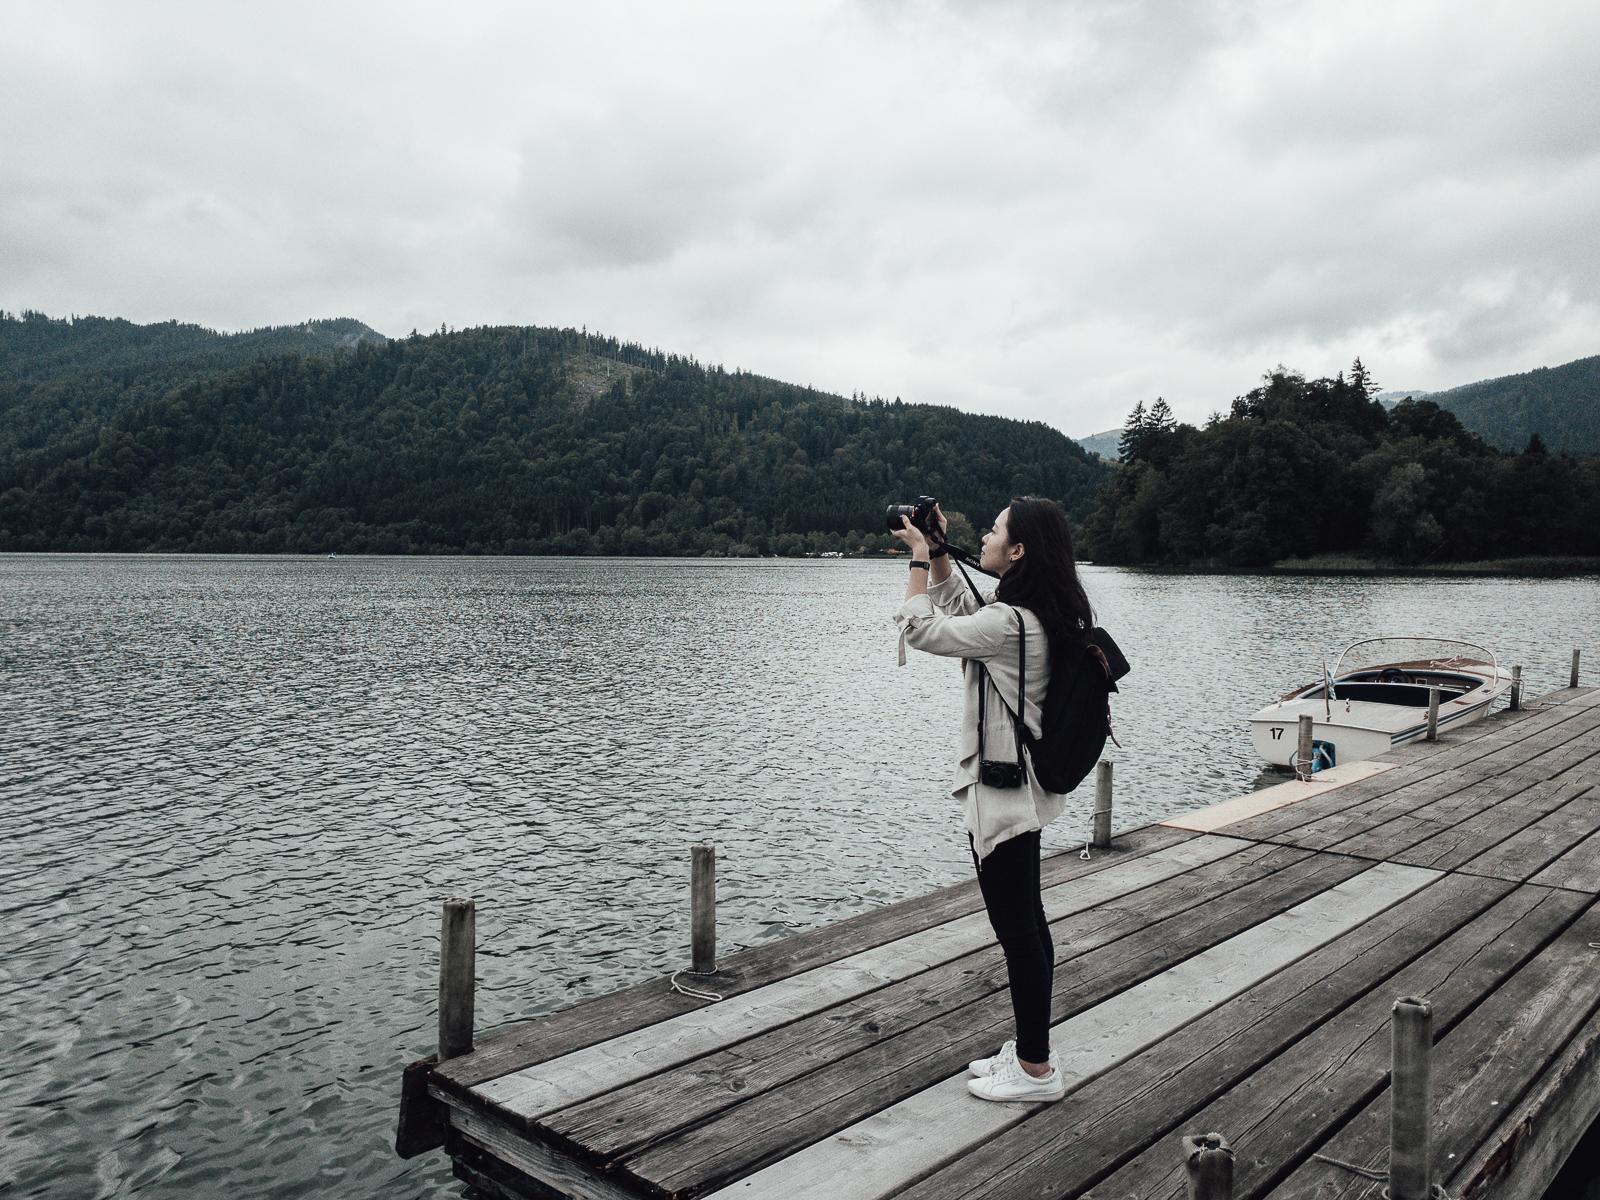 2019 Aug 慕尼黑攝影工作坊側拍 - Yes! Please Enjoy by Fanning Tseng-7.jpg